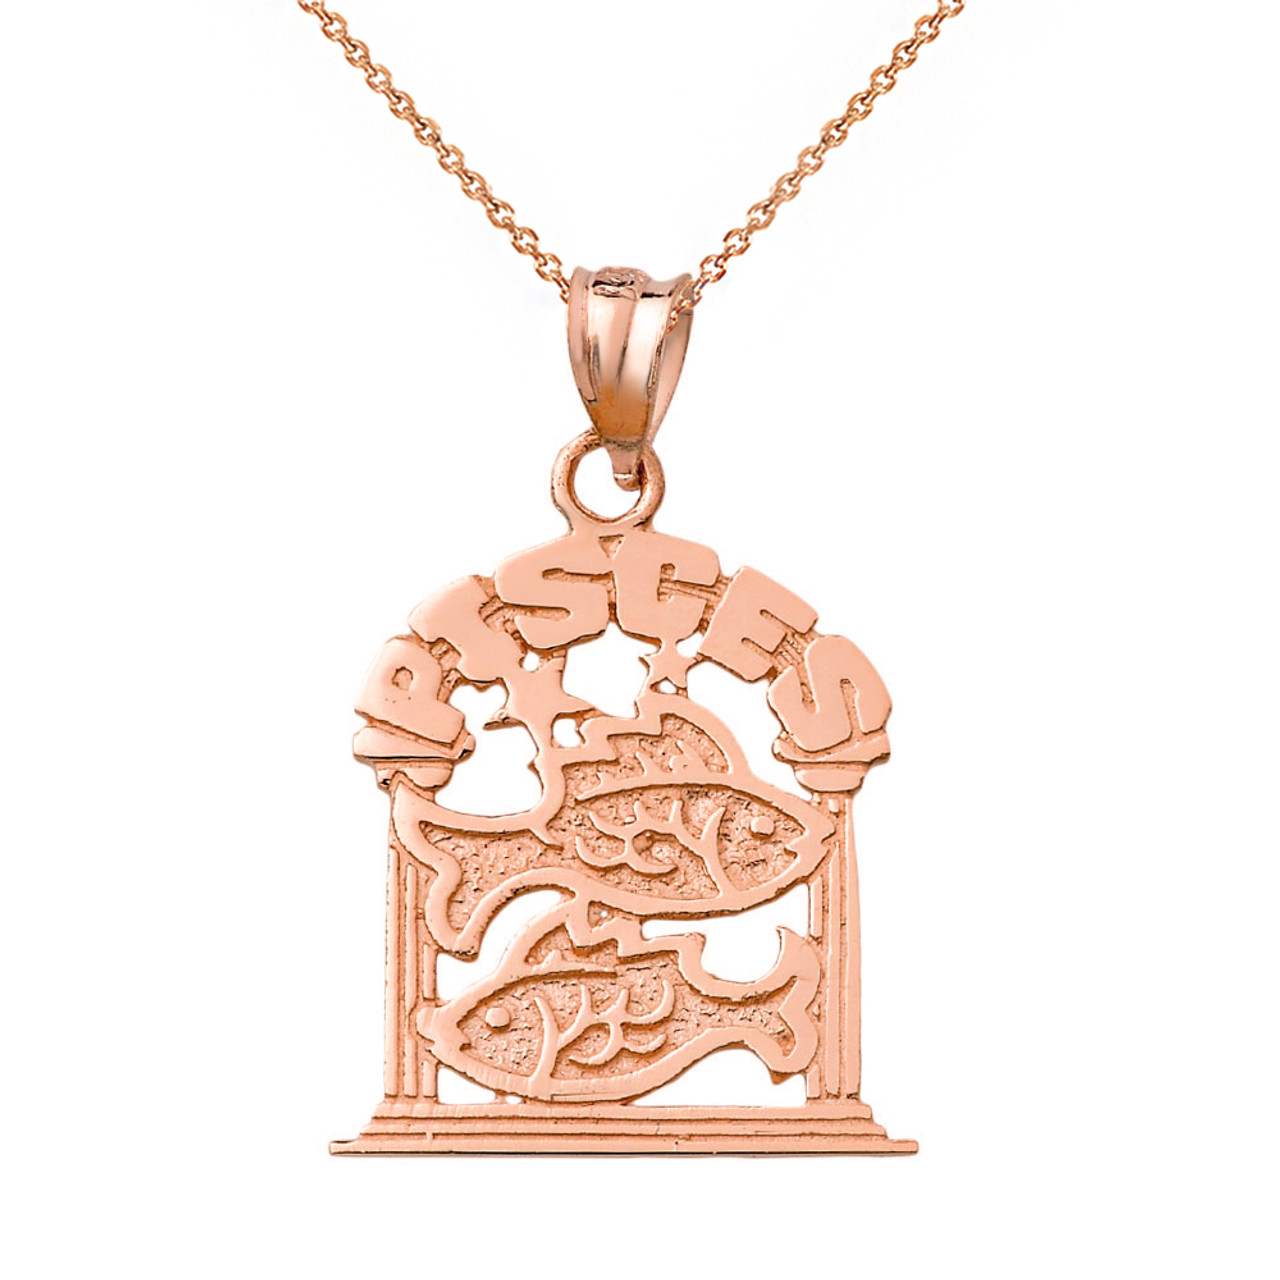 Solid rose gold zodiac pisces pendant necklace mozeypictures Choice Image